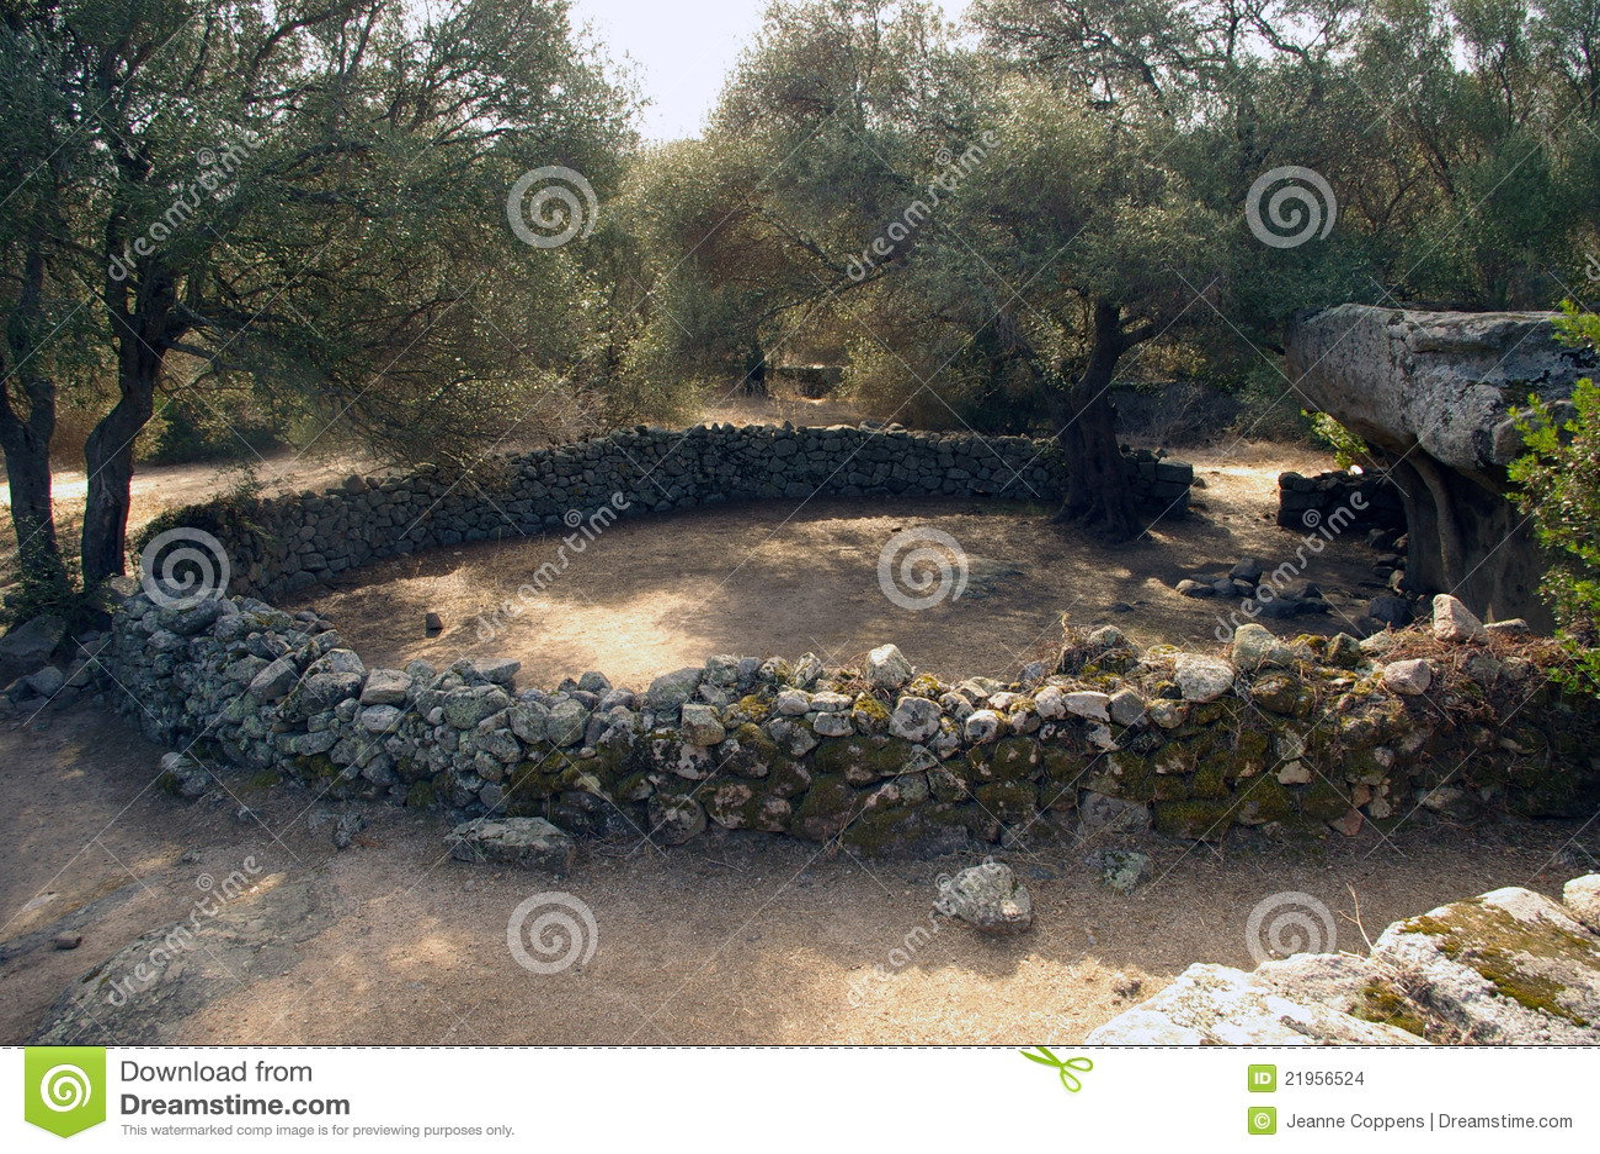 Sitio arqueológico en Cerdeña.